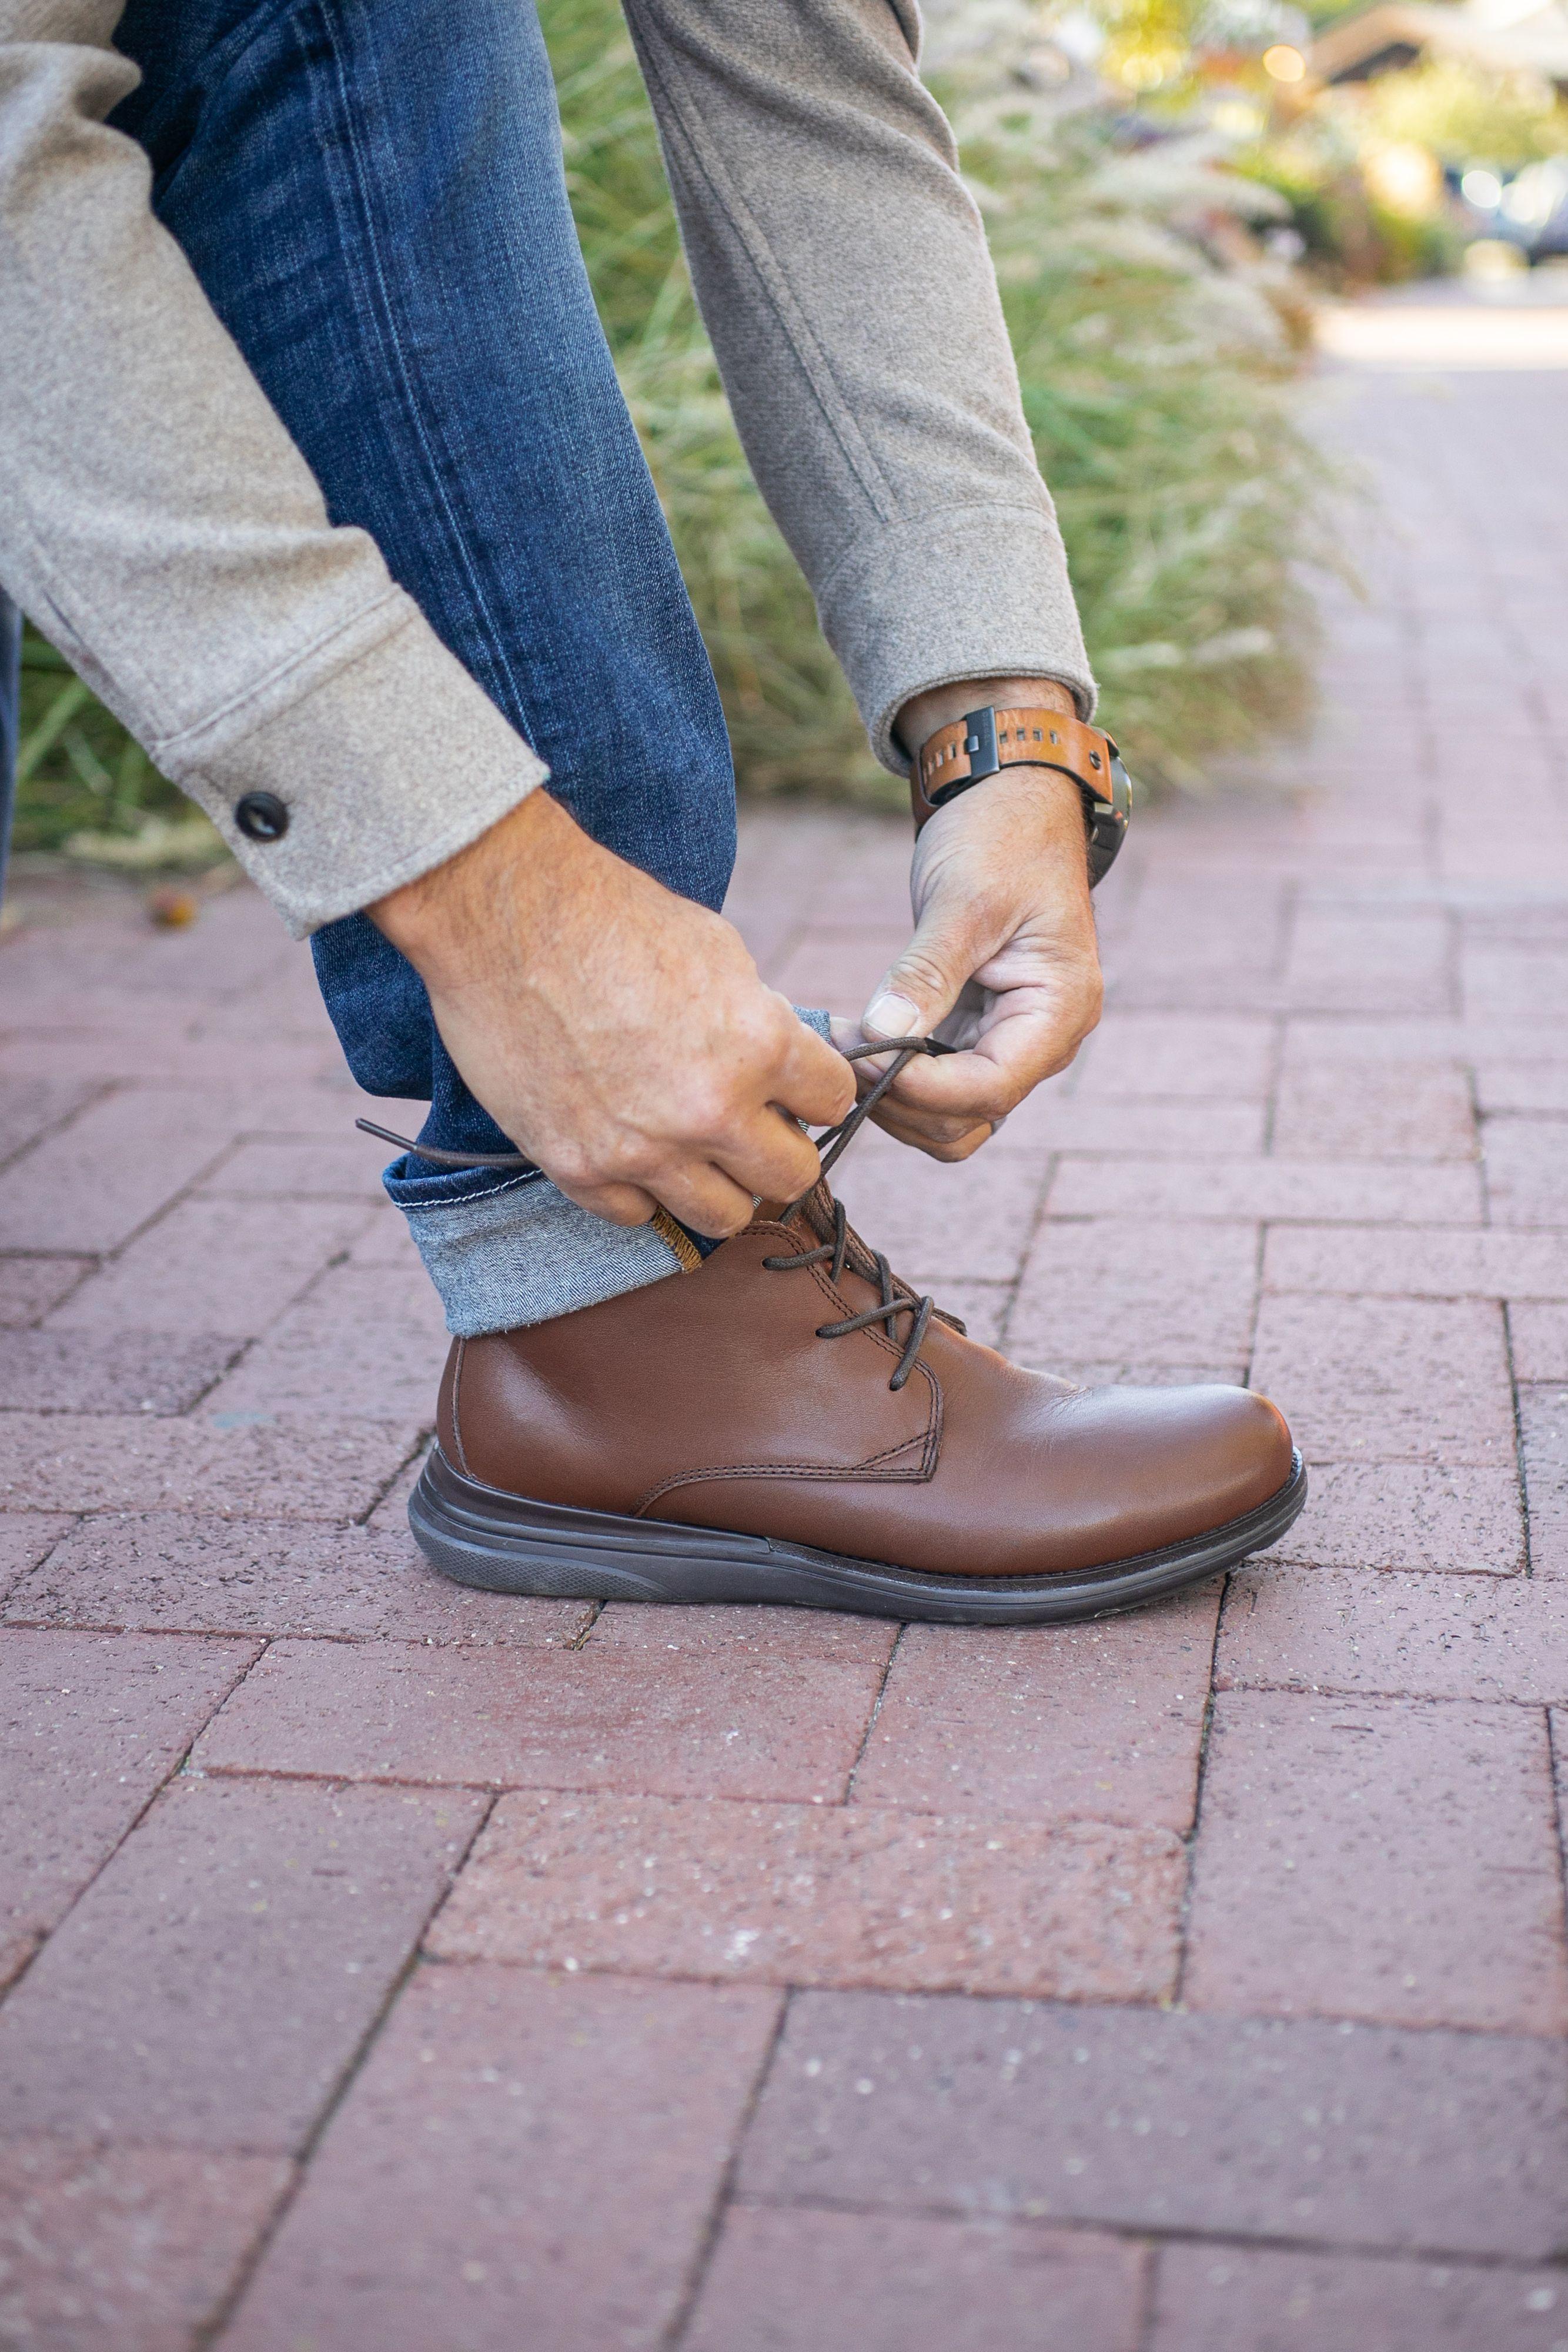 Pin on Bratscher C. Shoes